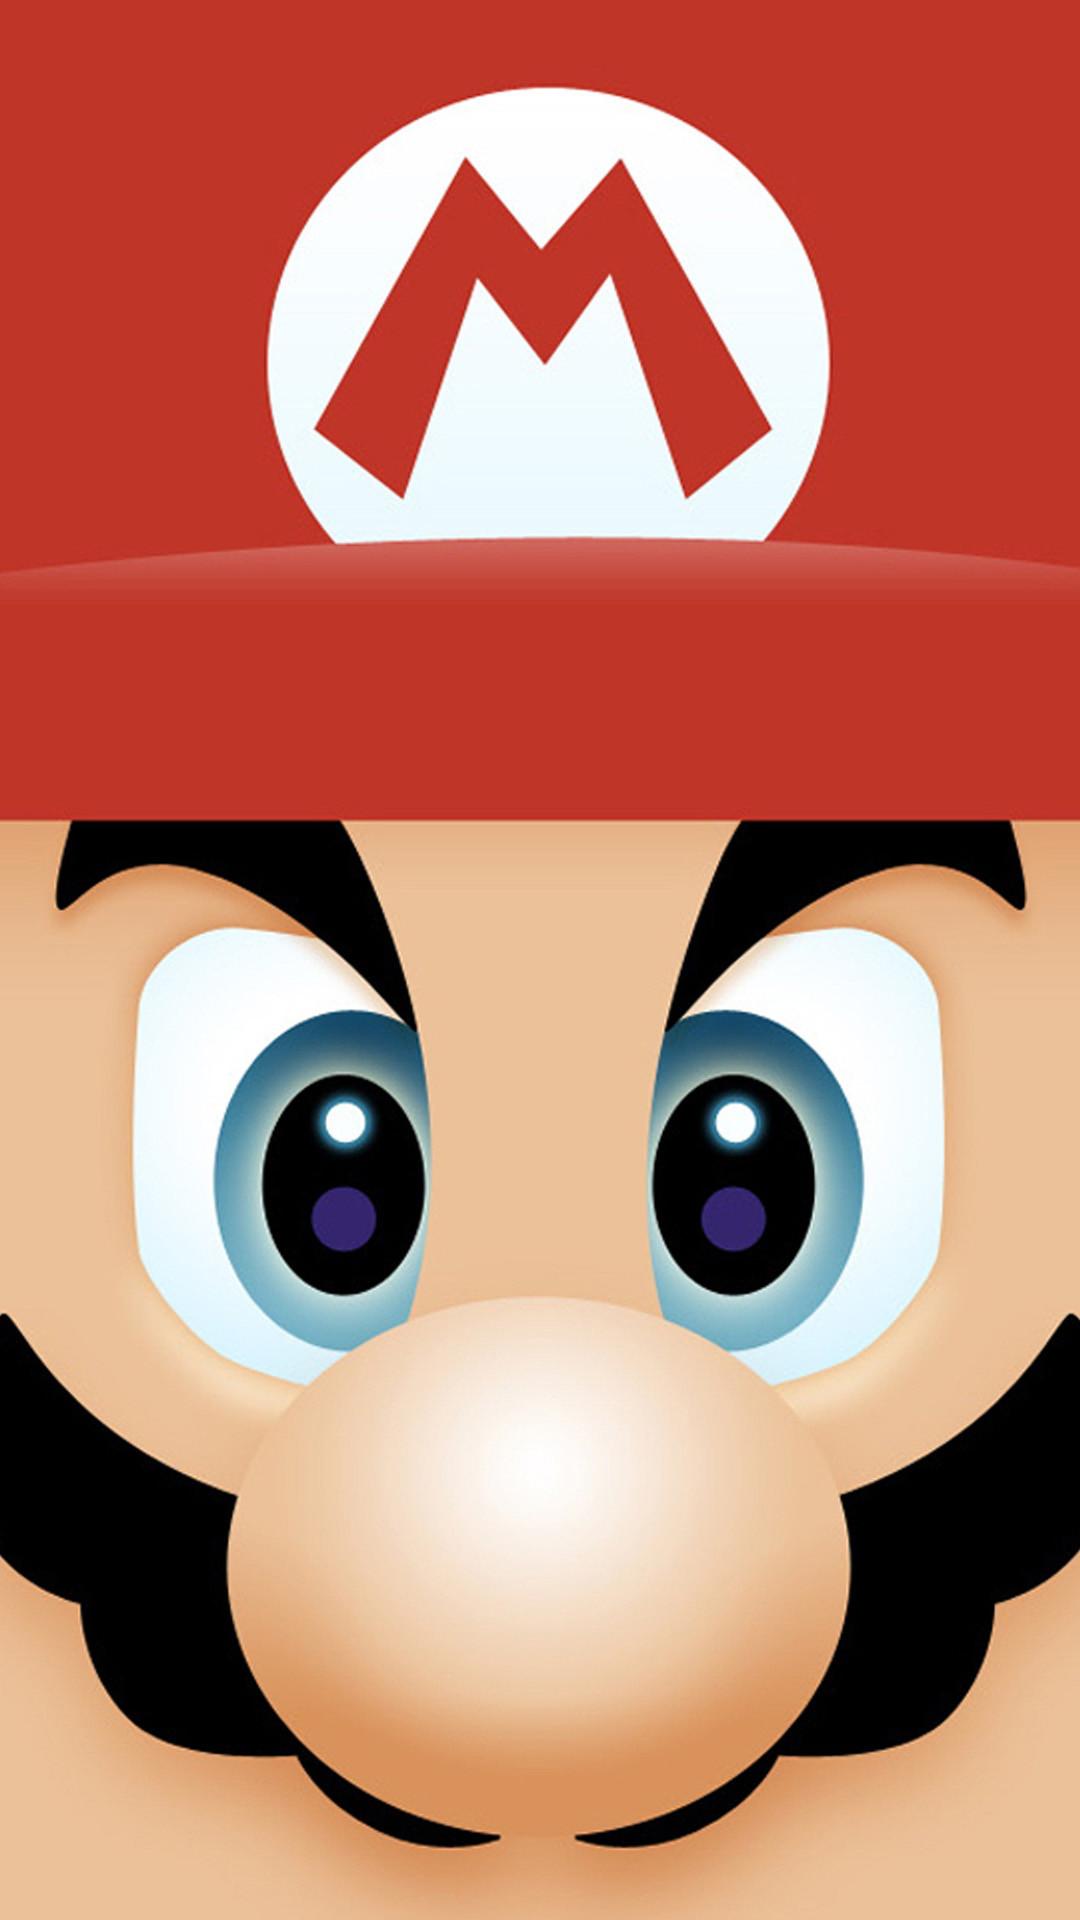 iPhone 6 plus Mario Face HD Wallpaper